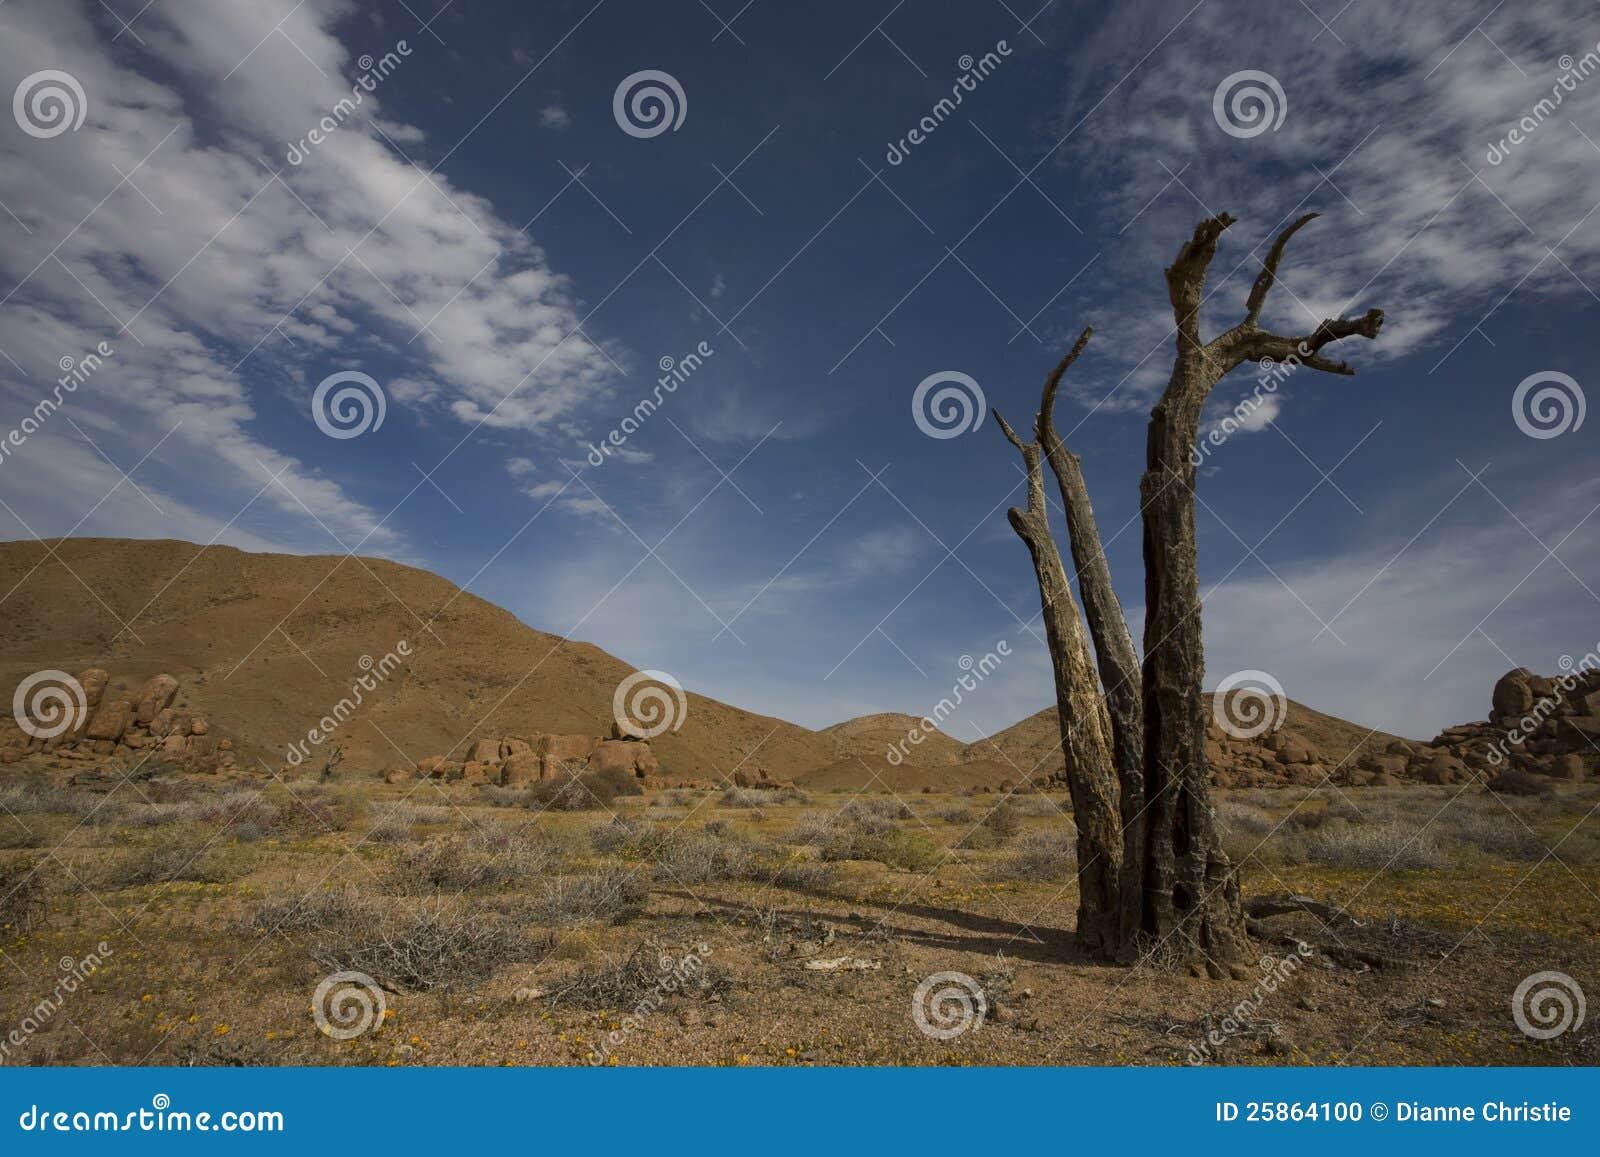 Richtersveld nationalpark, South Africa.